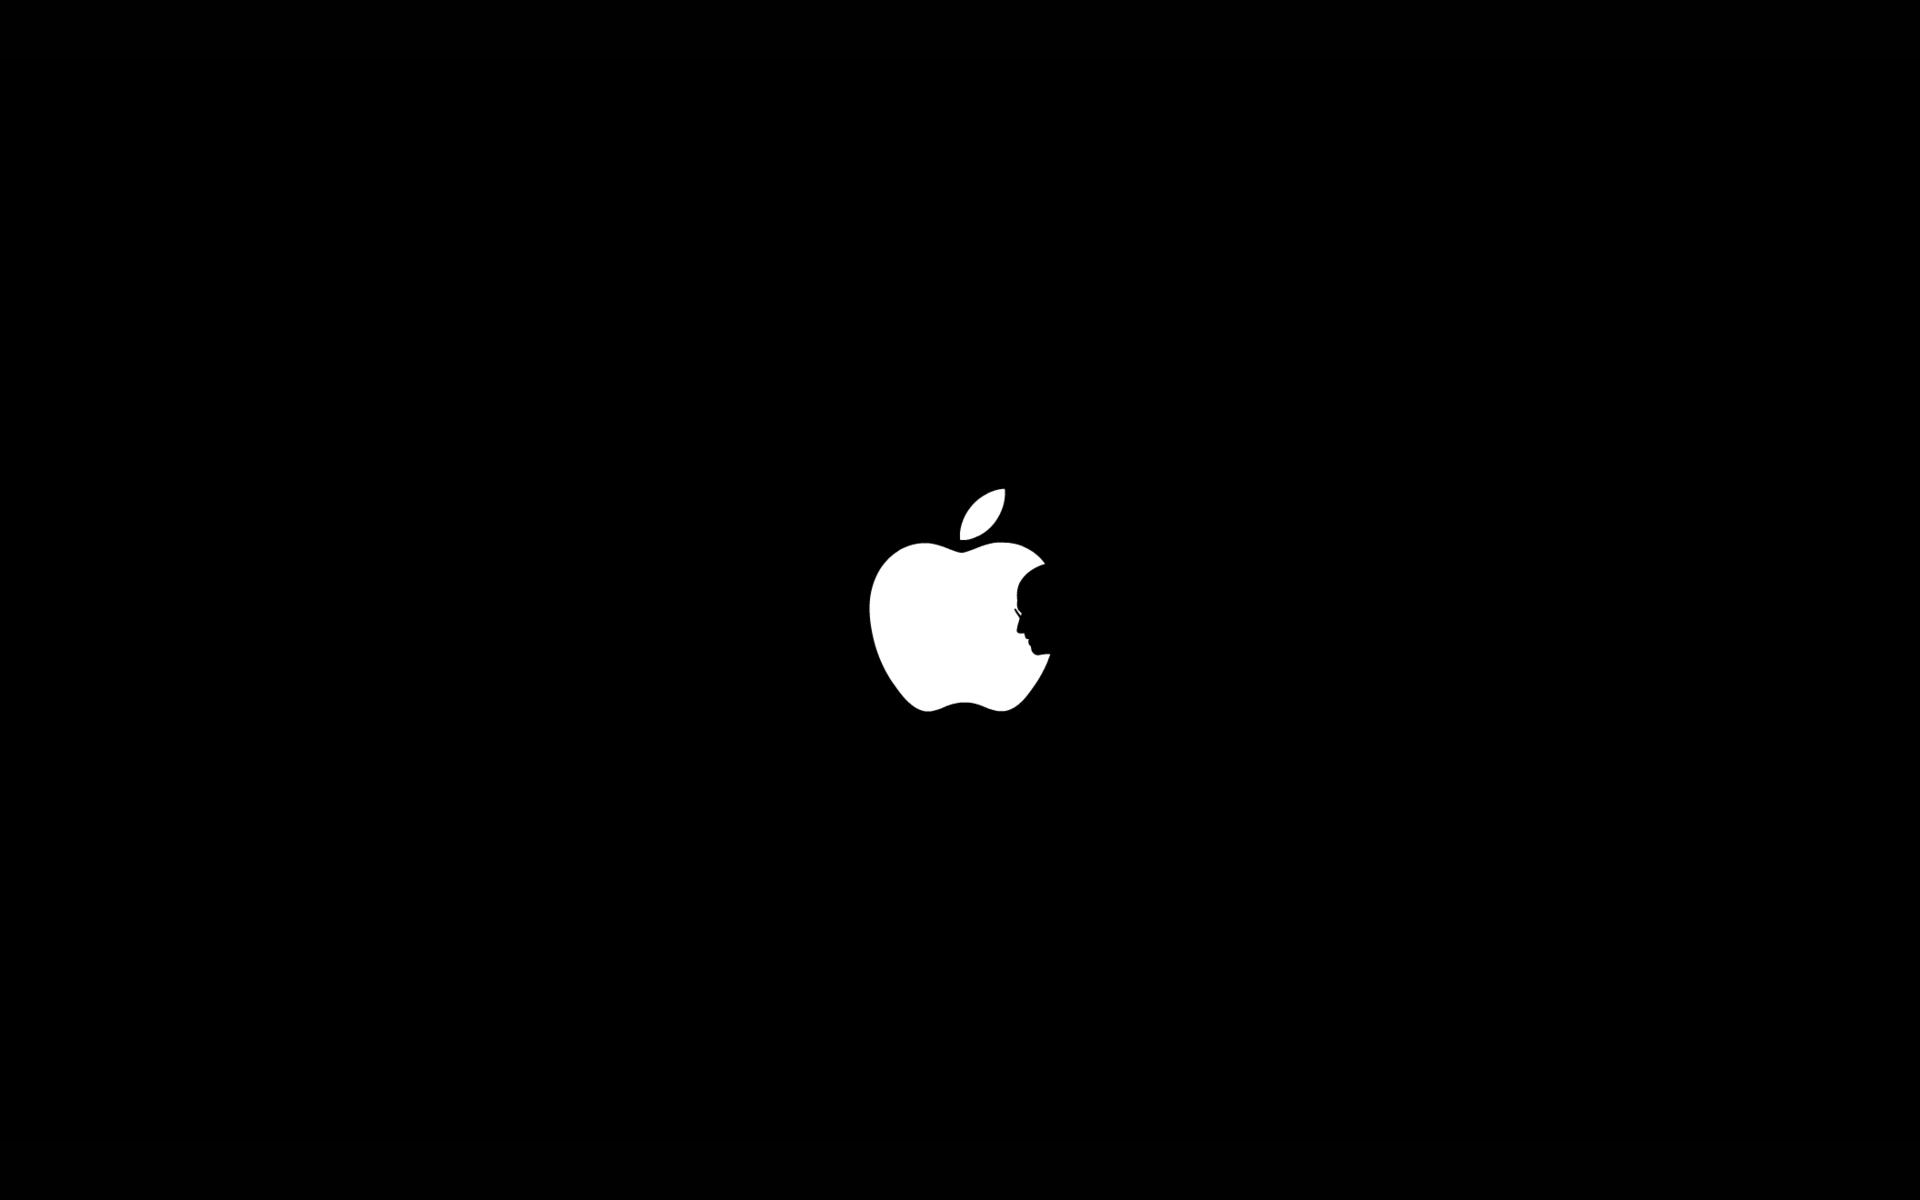 full bodied glory apple logo computer hd wallpaper 19201200 5993 1920x1200